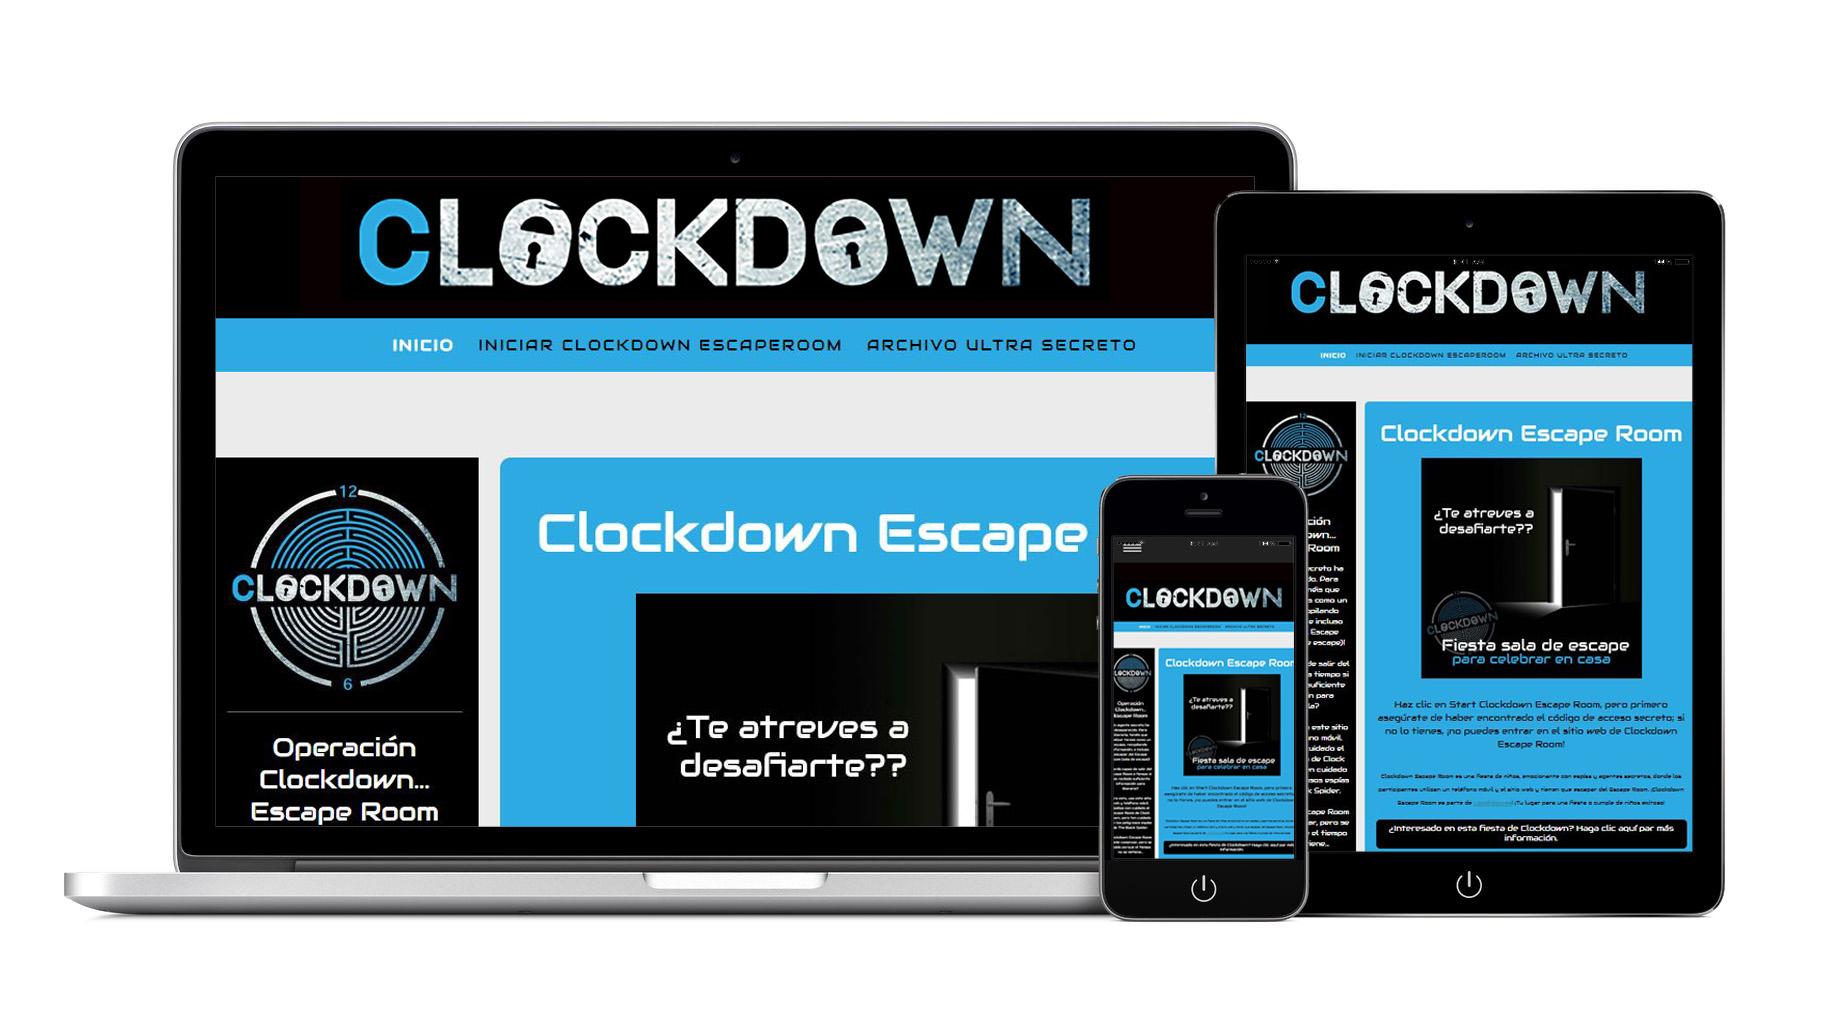 aparatos fiesta Clockdown